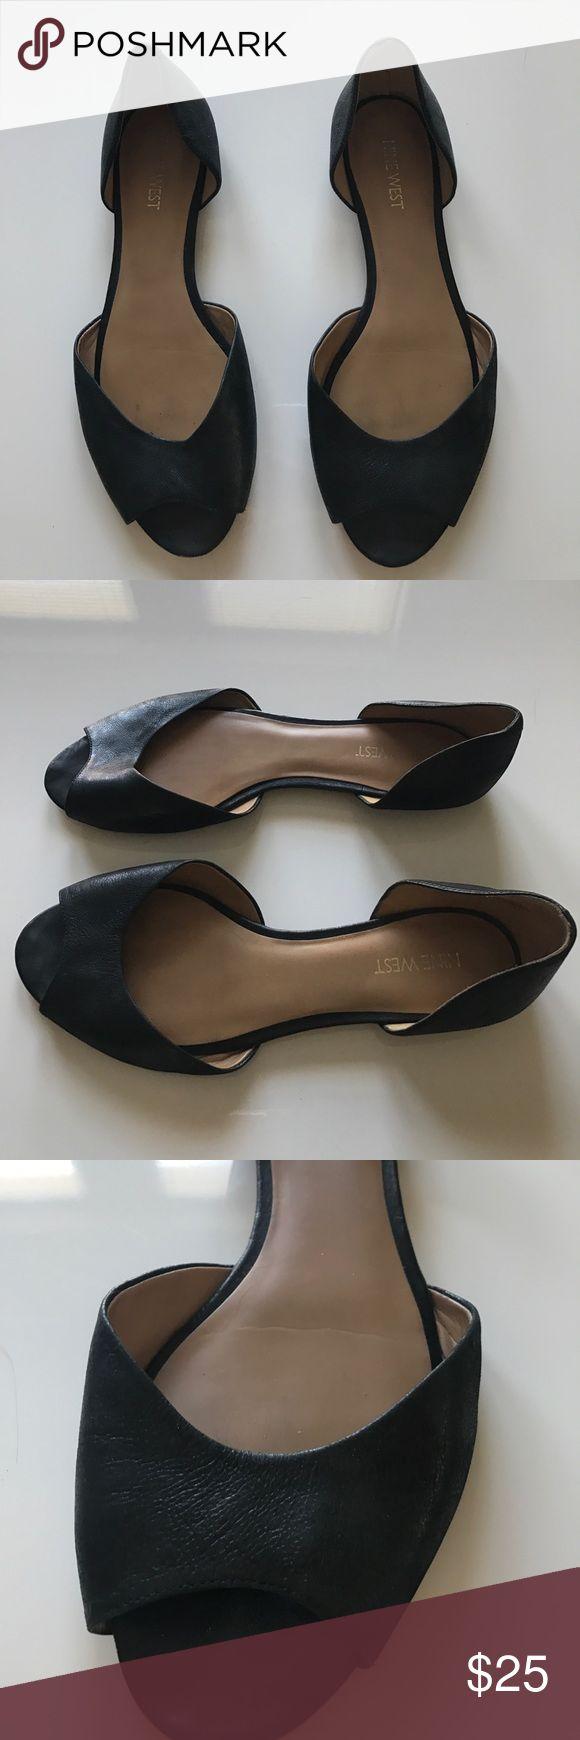 Nine West black leather flats - good condition Barely worn black leather Nine West flats - good condition Nine West Shoes Flats & Loafers